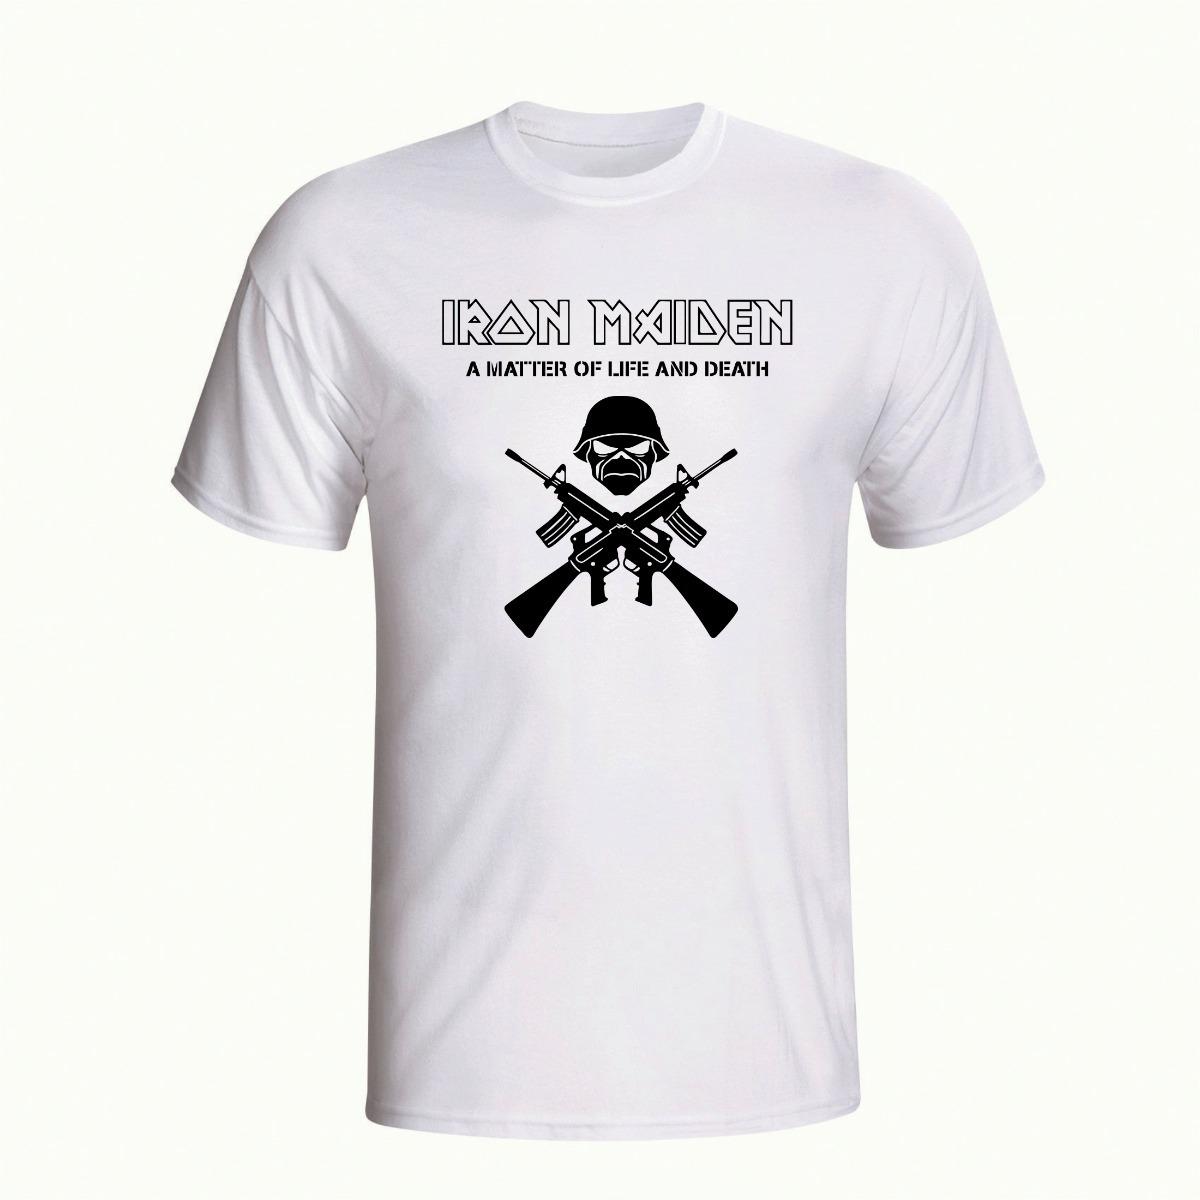 97c28c66e camisa camiseta iron maiden rock heavy metal banda branca. Carregando zoom.